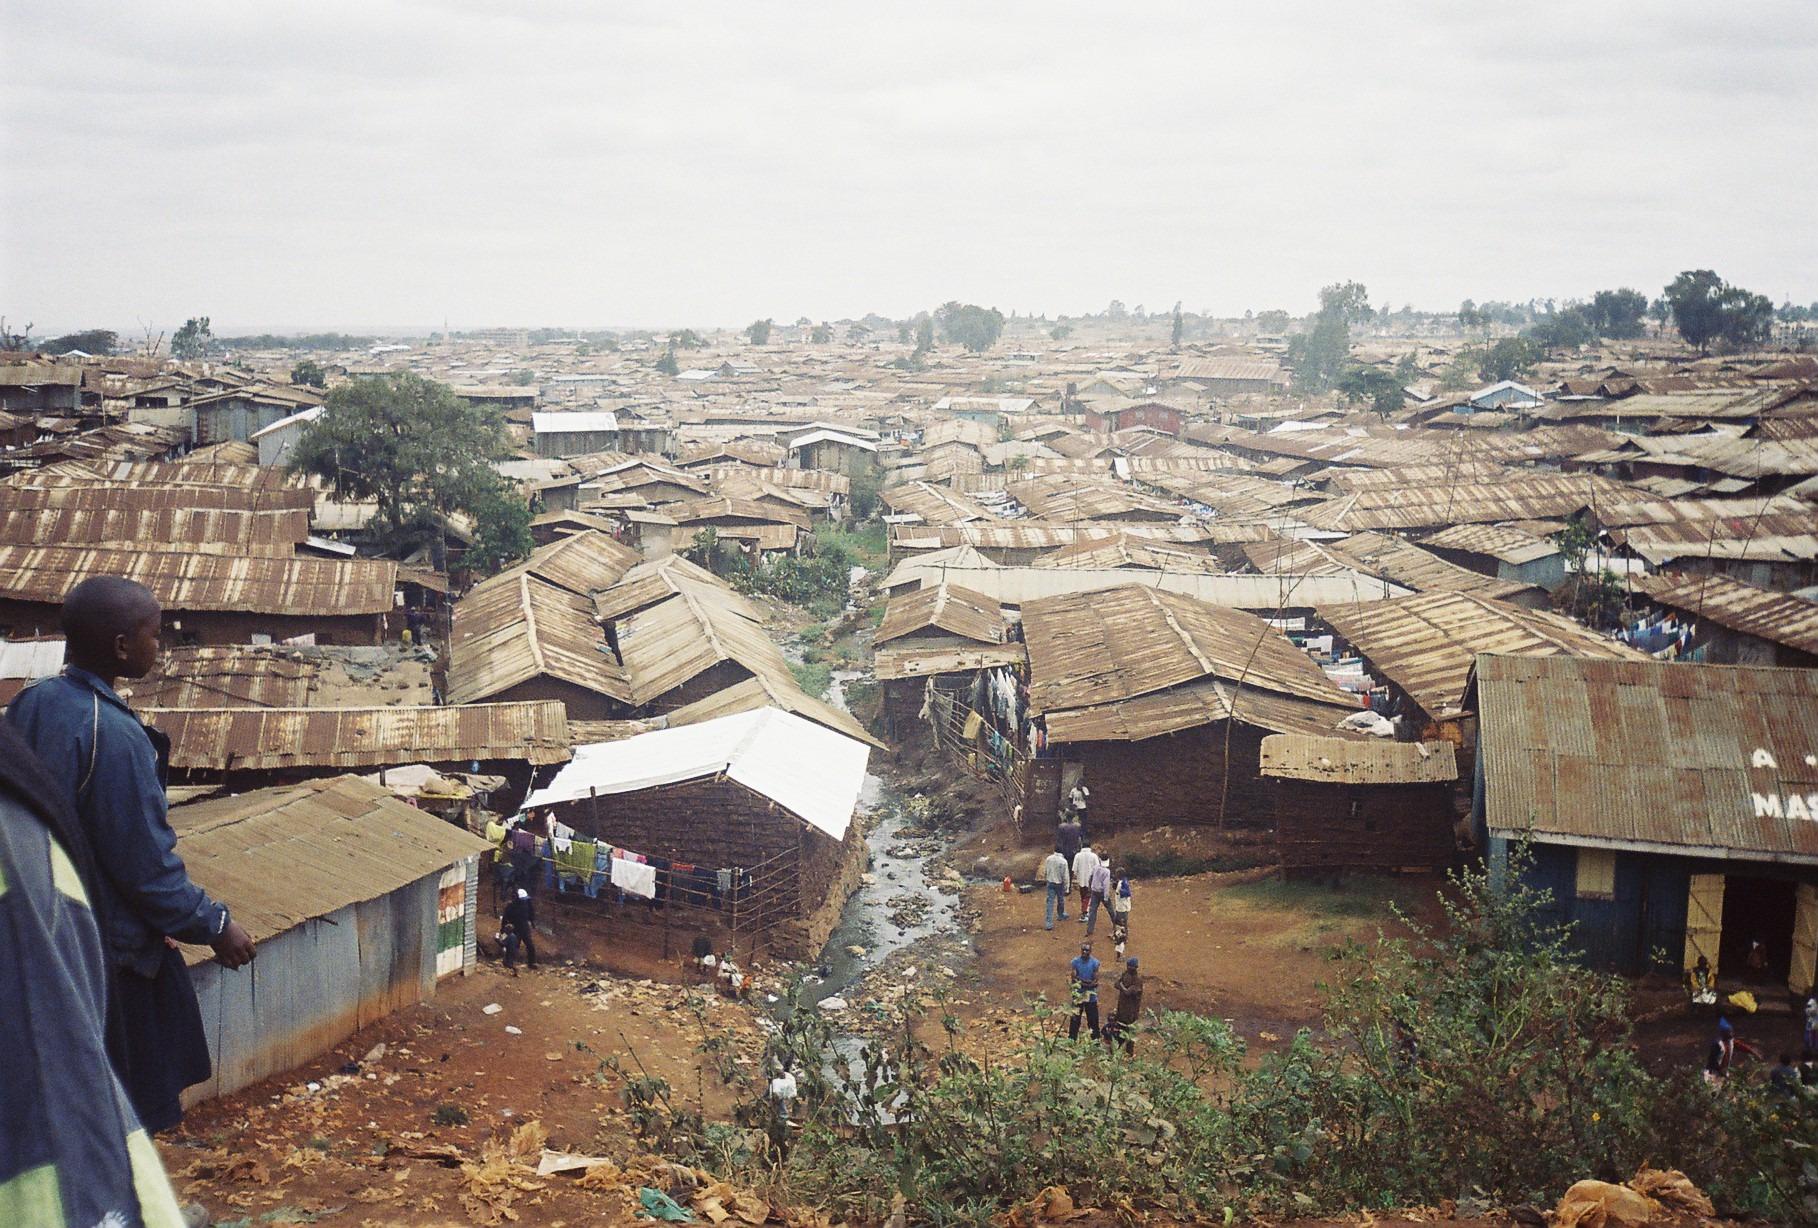 Koronavírus v africkom slume